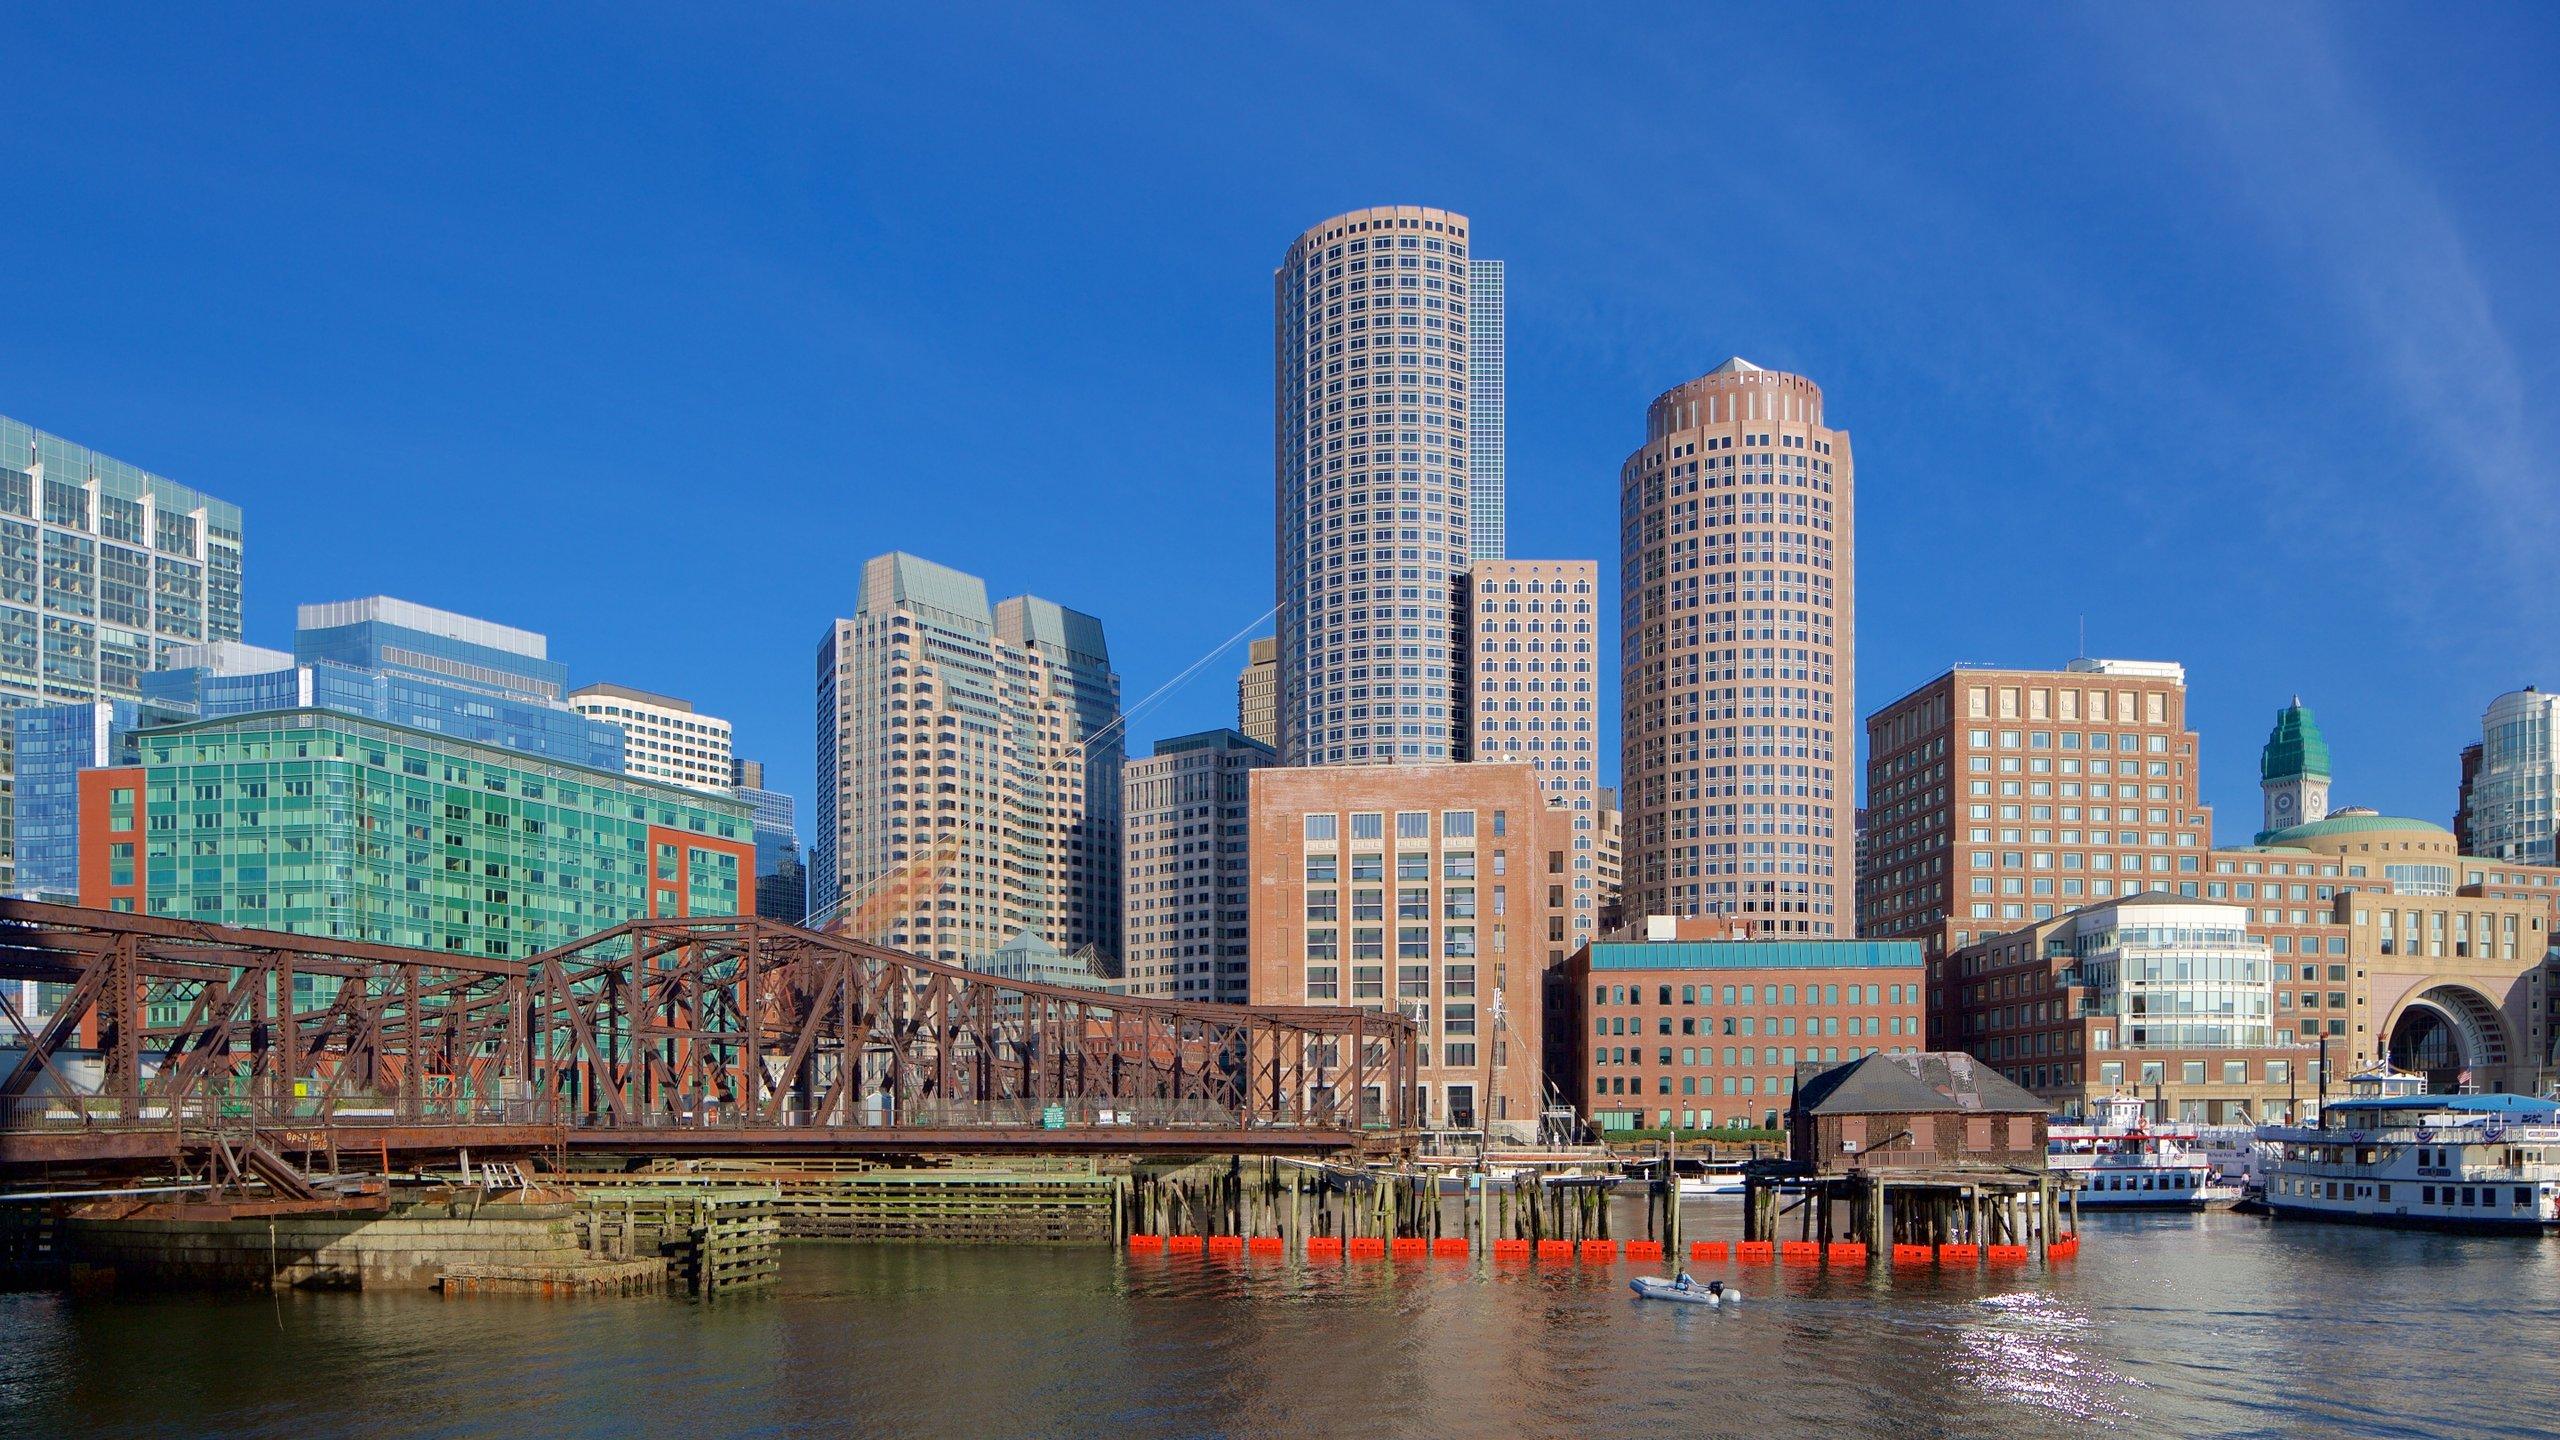 South Boston, Boston, Massachusetts, United States of America